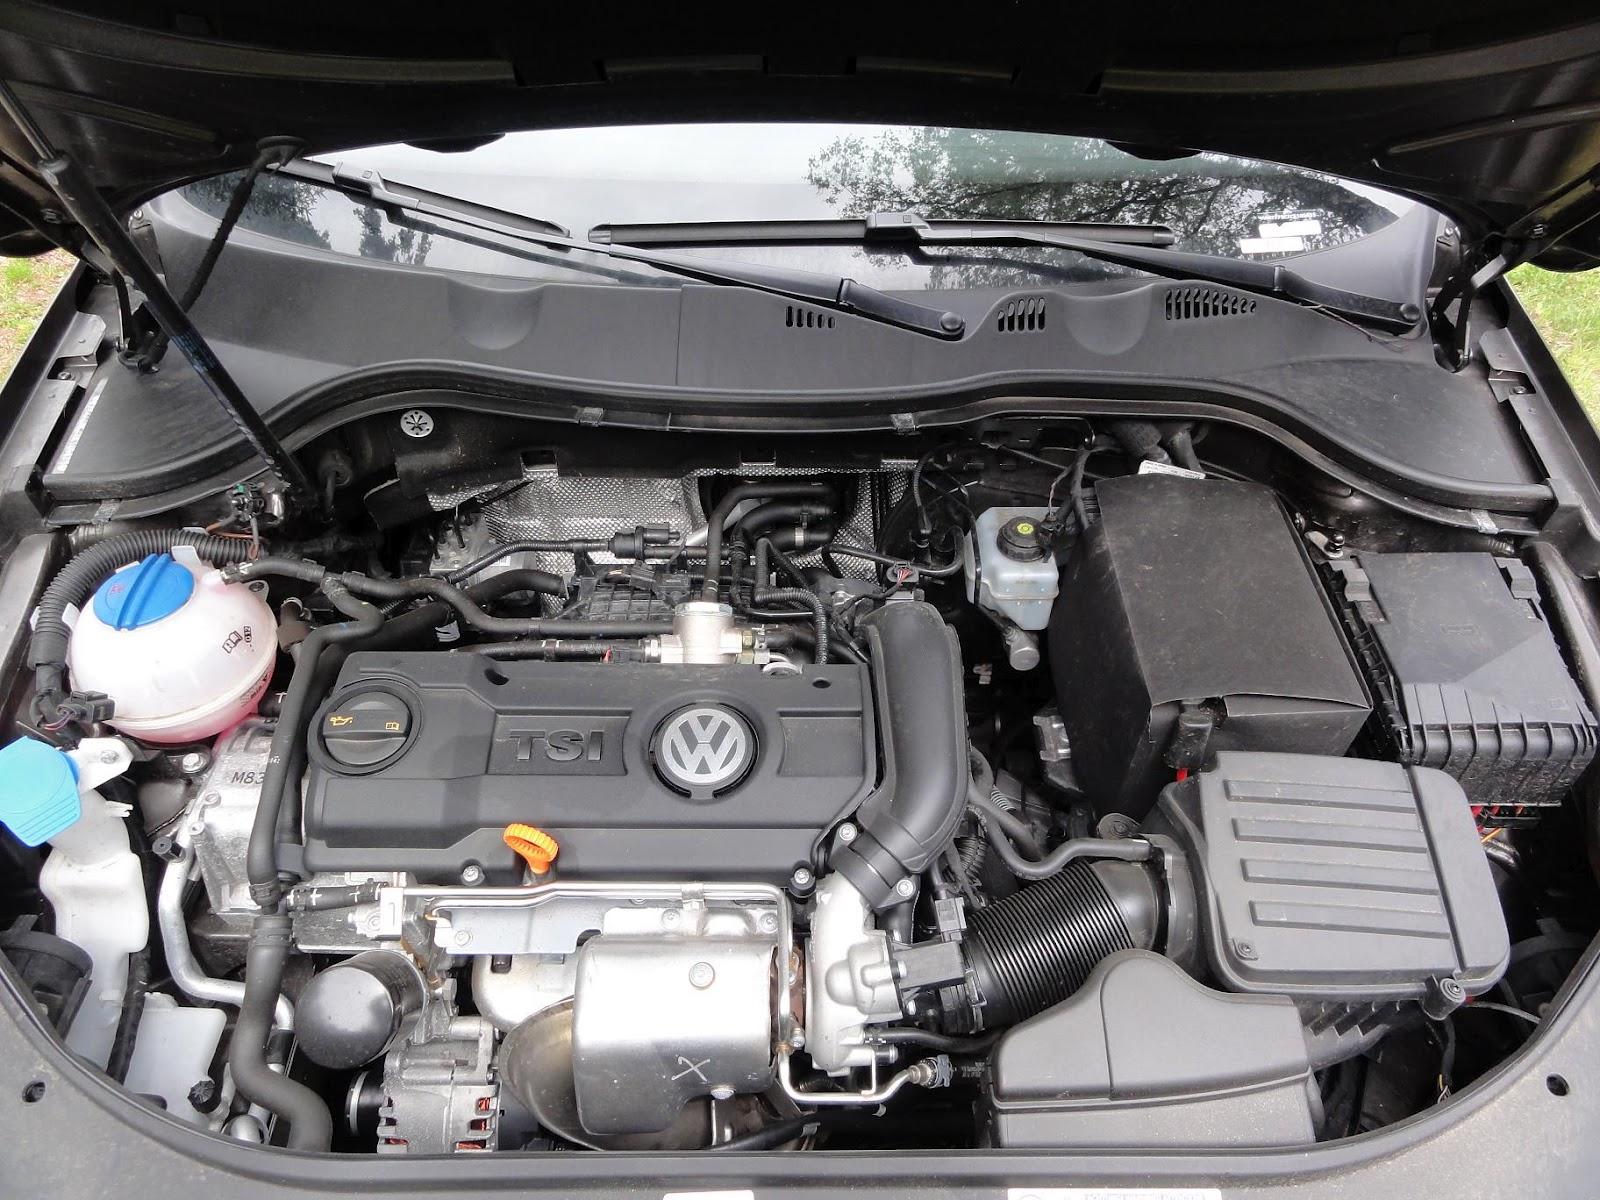 Volkswagen Passat Variant 1.4 Tsi Ecofuel Usata - Auto ...